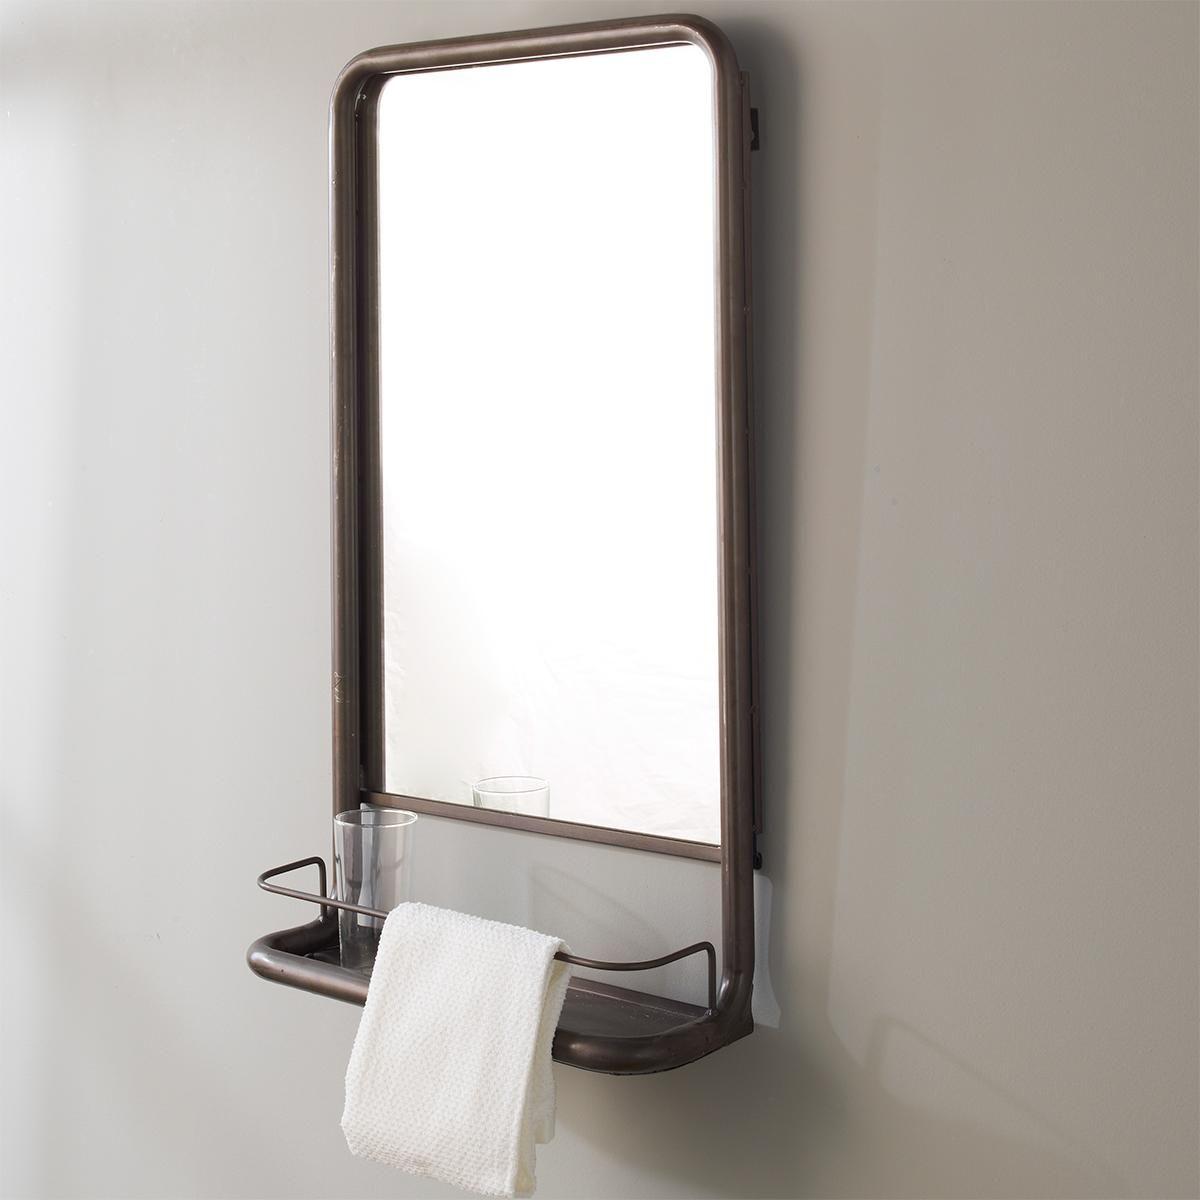 Metal Mirror With Shelf Small Bathroom Mirror With Shelf Industrial Style Bathroom Mirror With Shelf